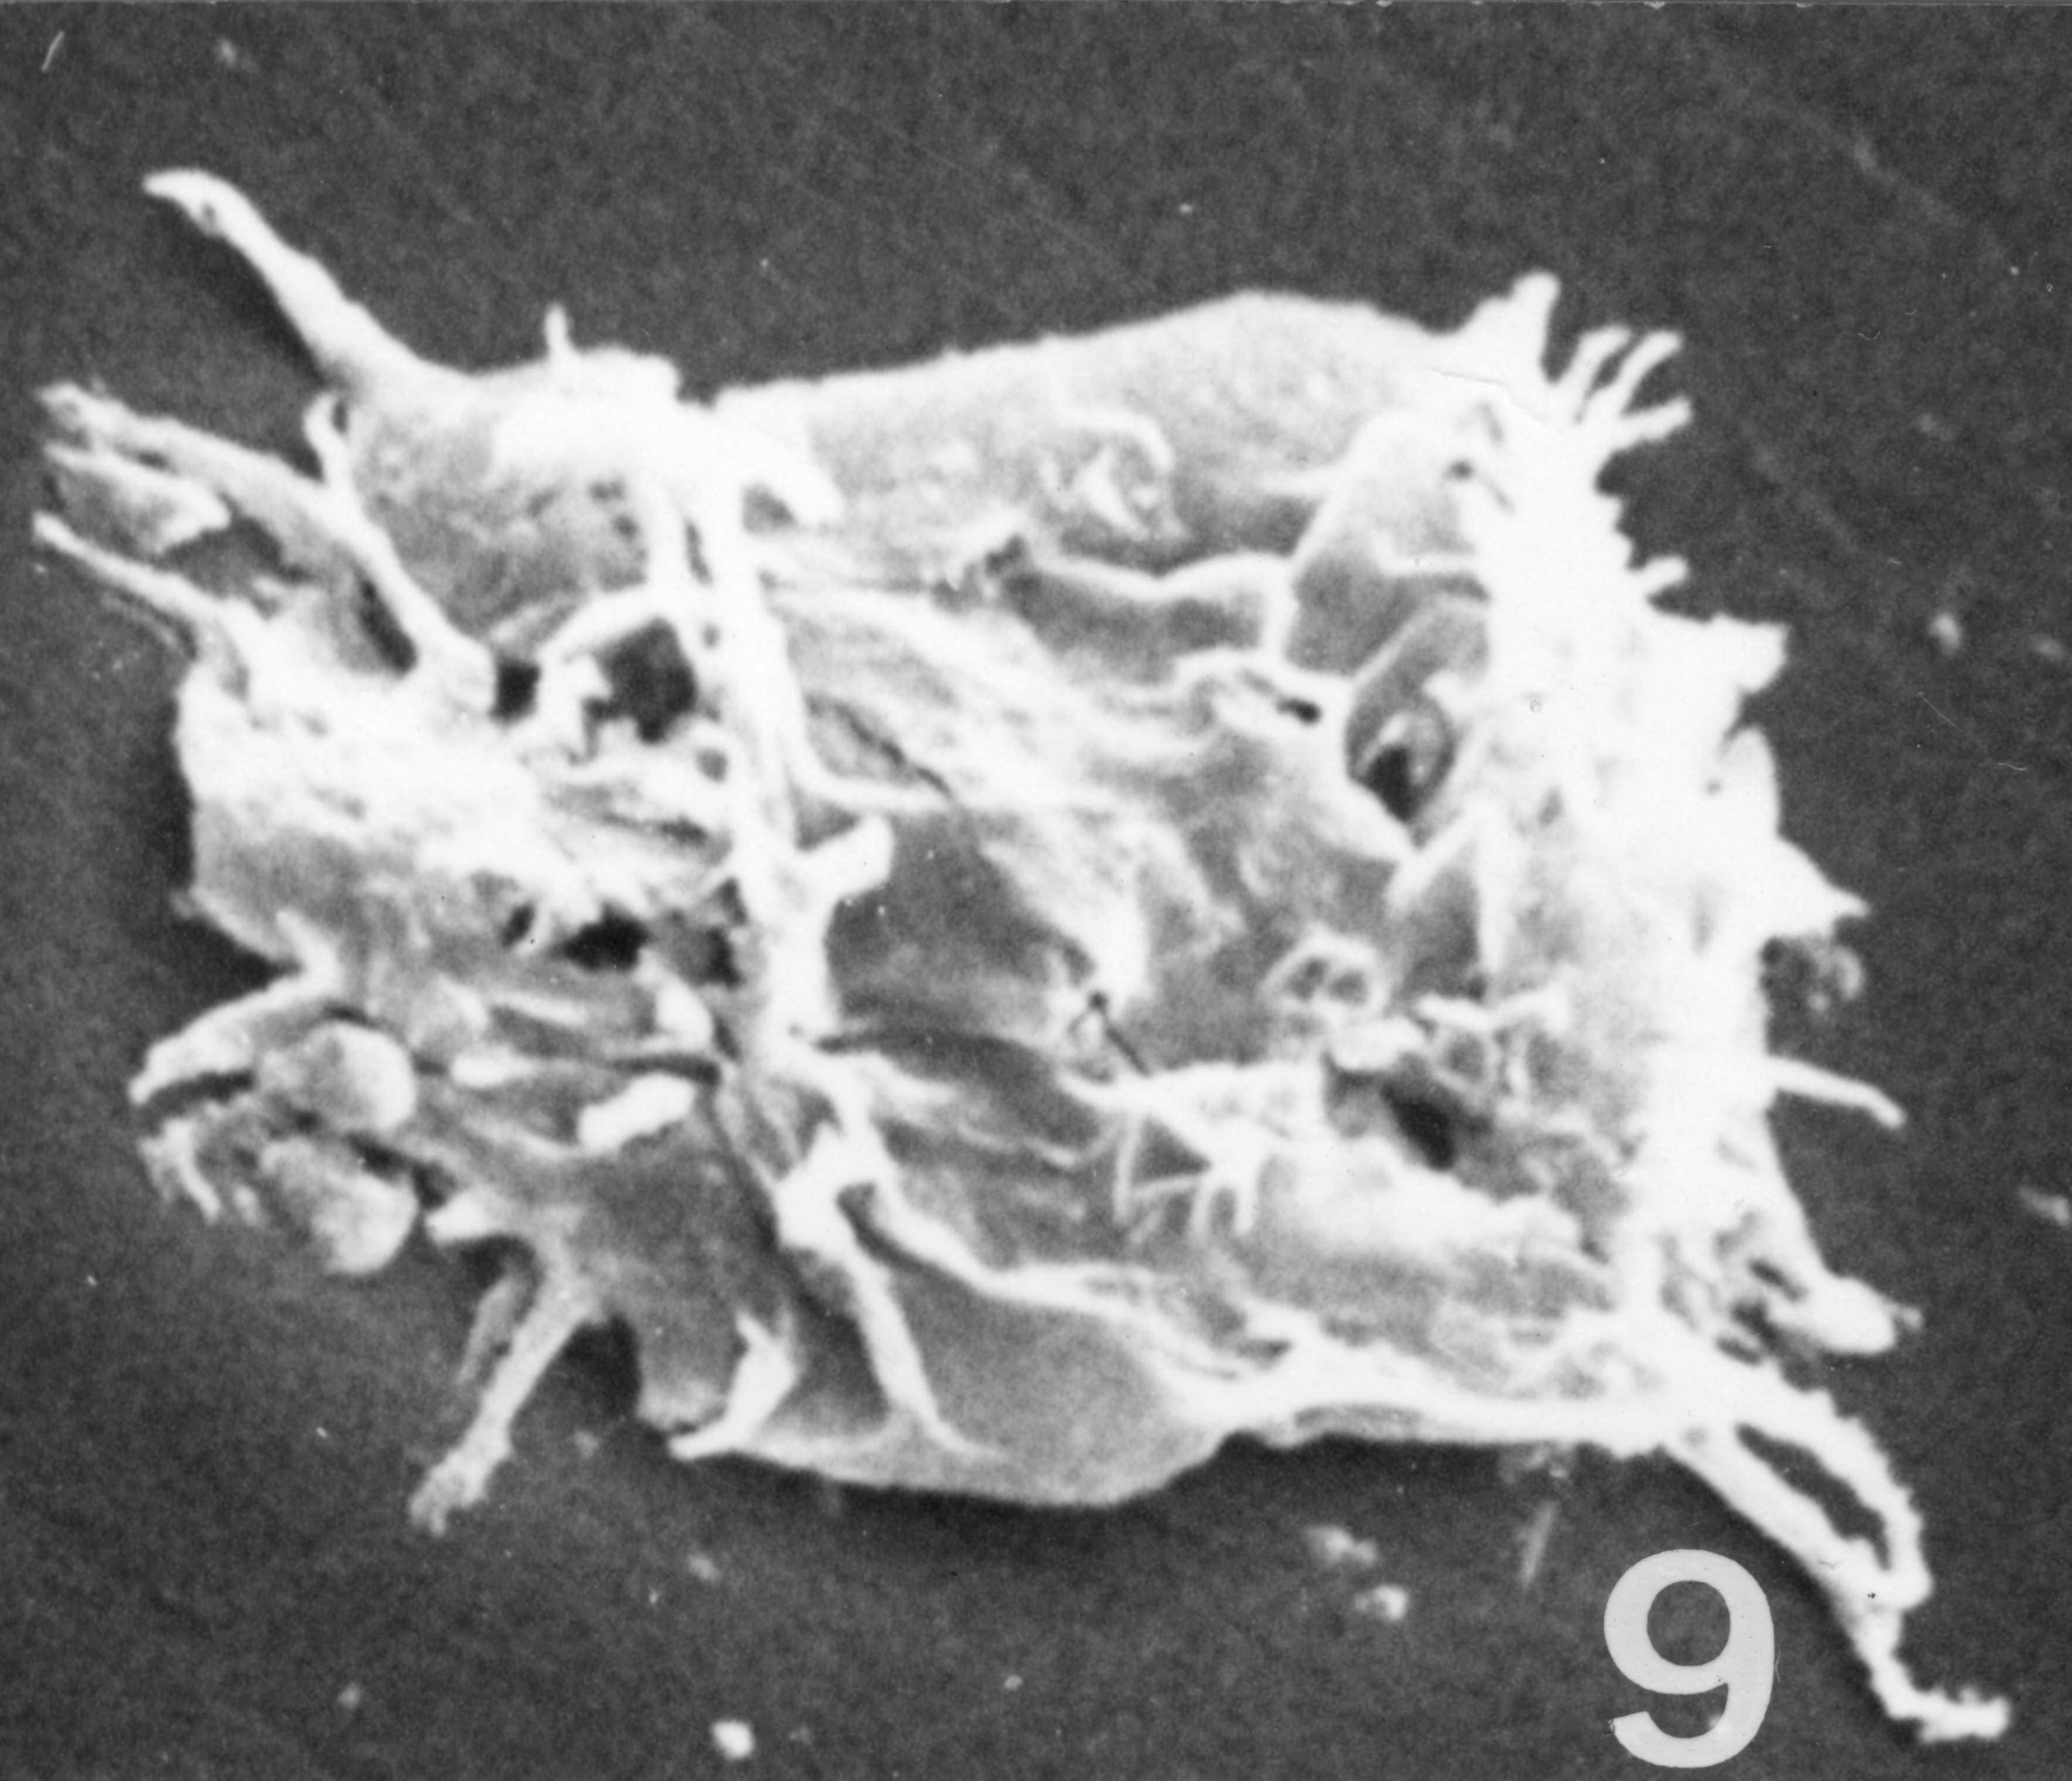 Fig. 9 - Acanthodiacrodium ubui Martin, F., 1969. CHE-31. I. R. Se. N. B. No b531.